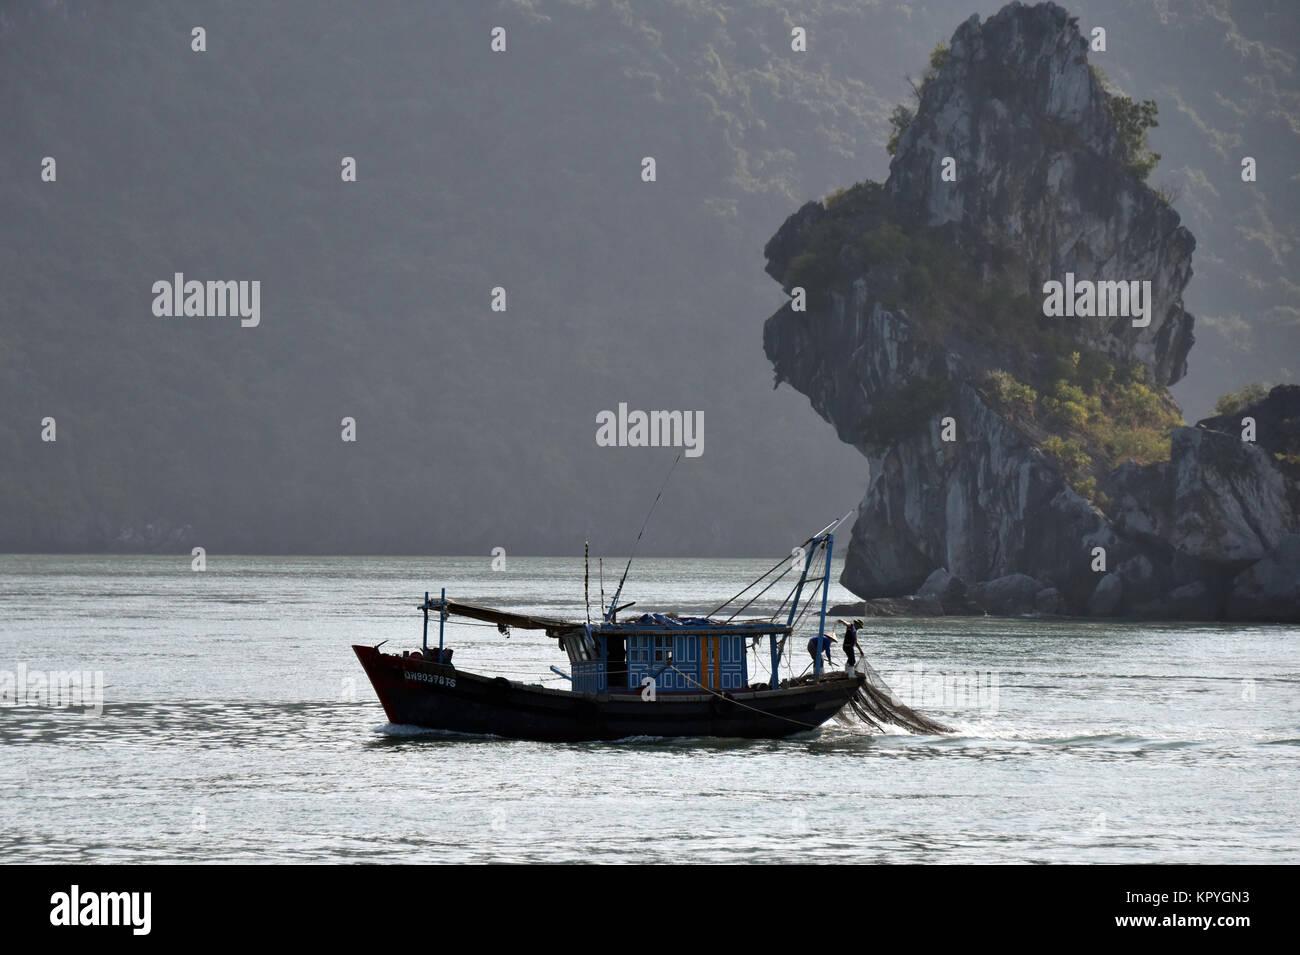 Ha Long bay, Vietnam, Asia - Stock Image